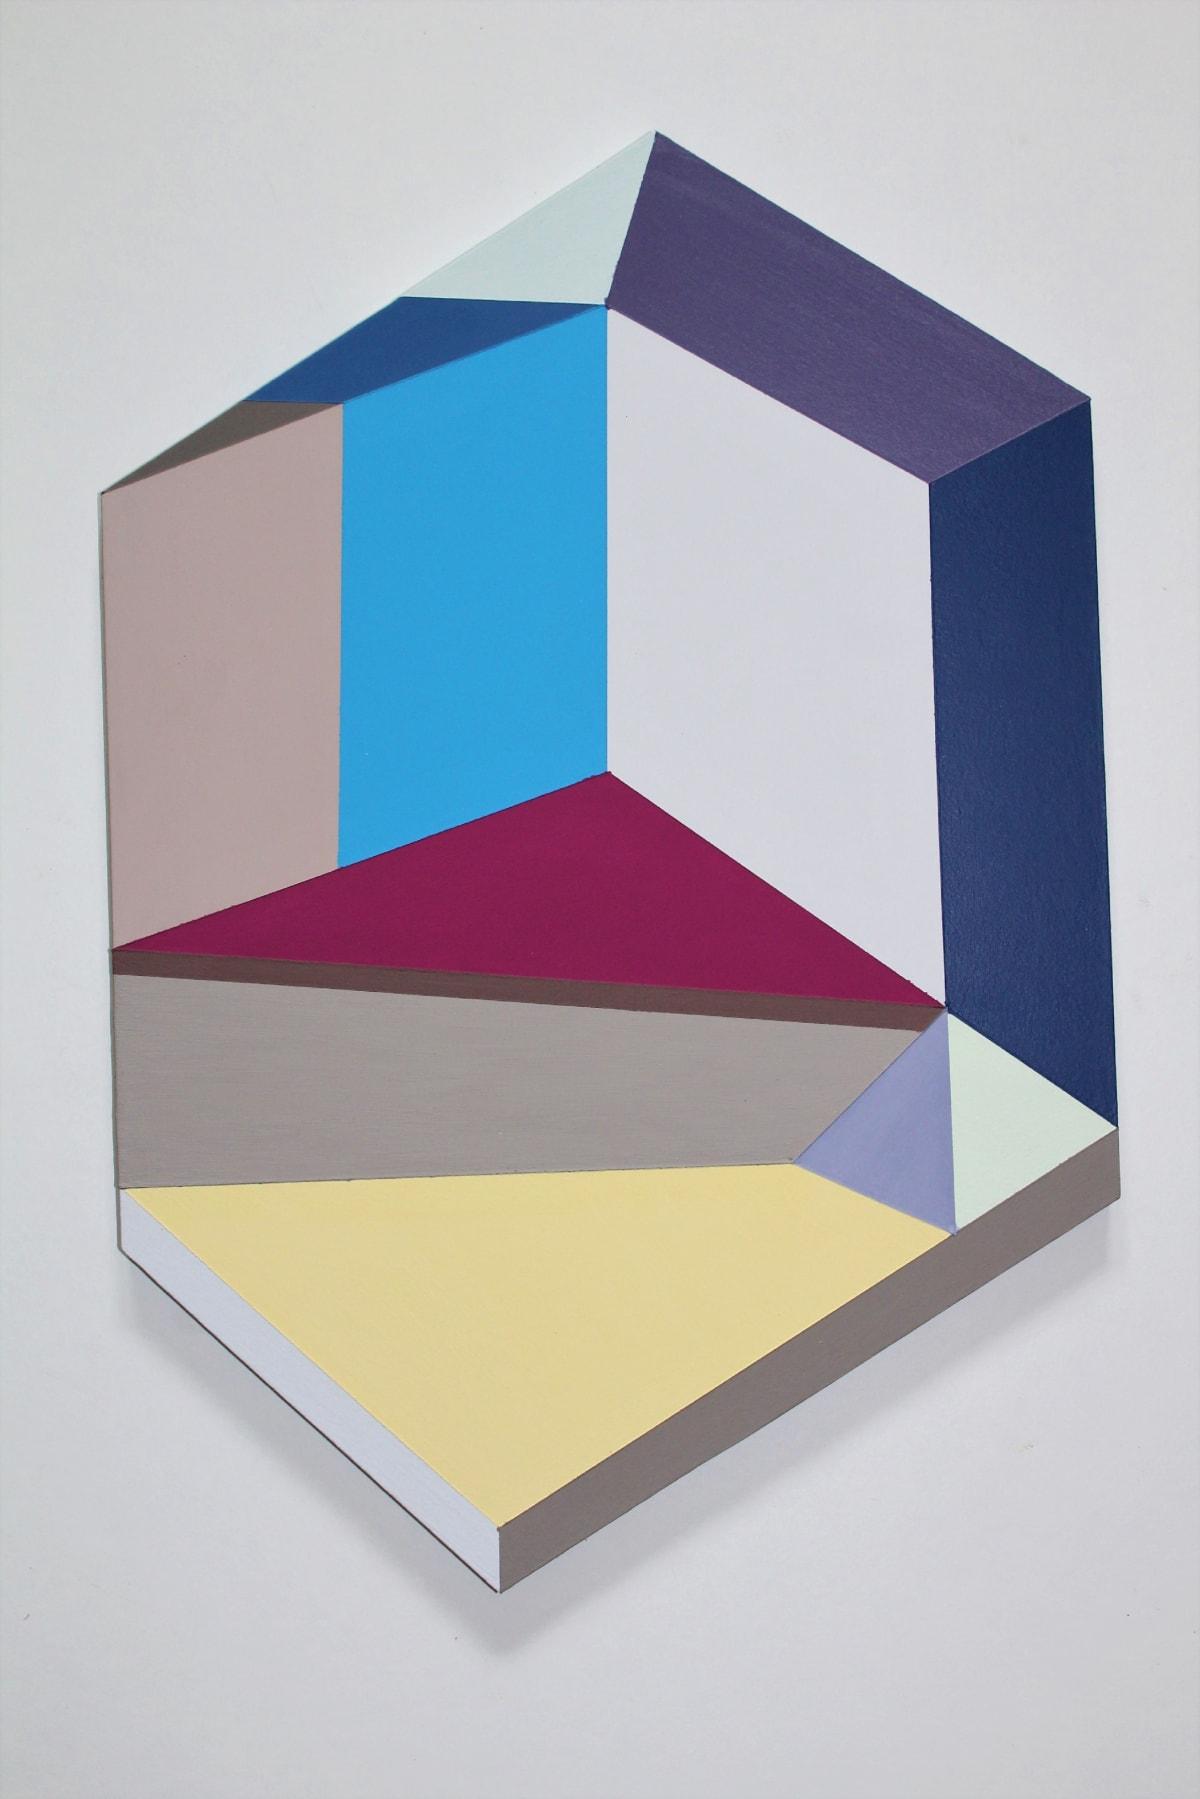 Megan Burns, Altered space 0.11, emulsion on board, 45 x 31 cm